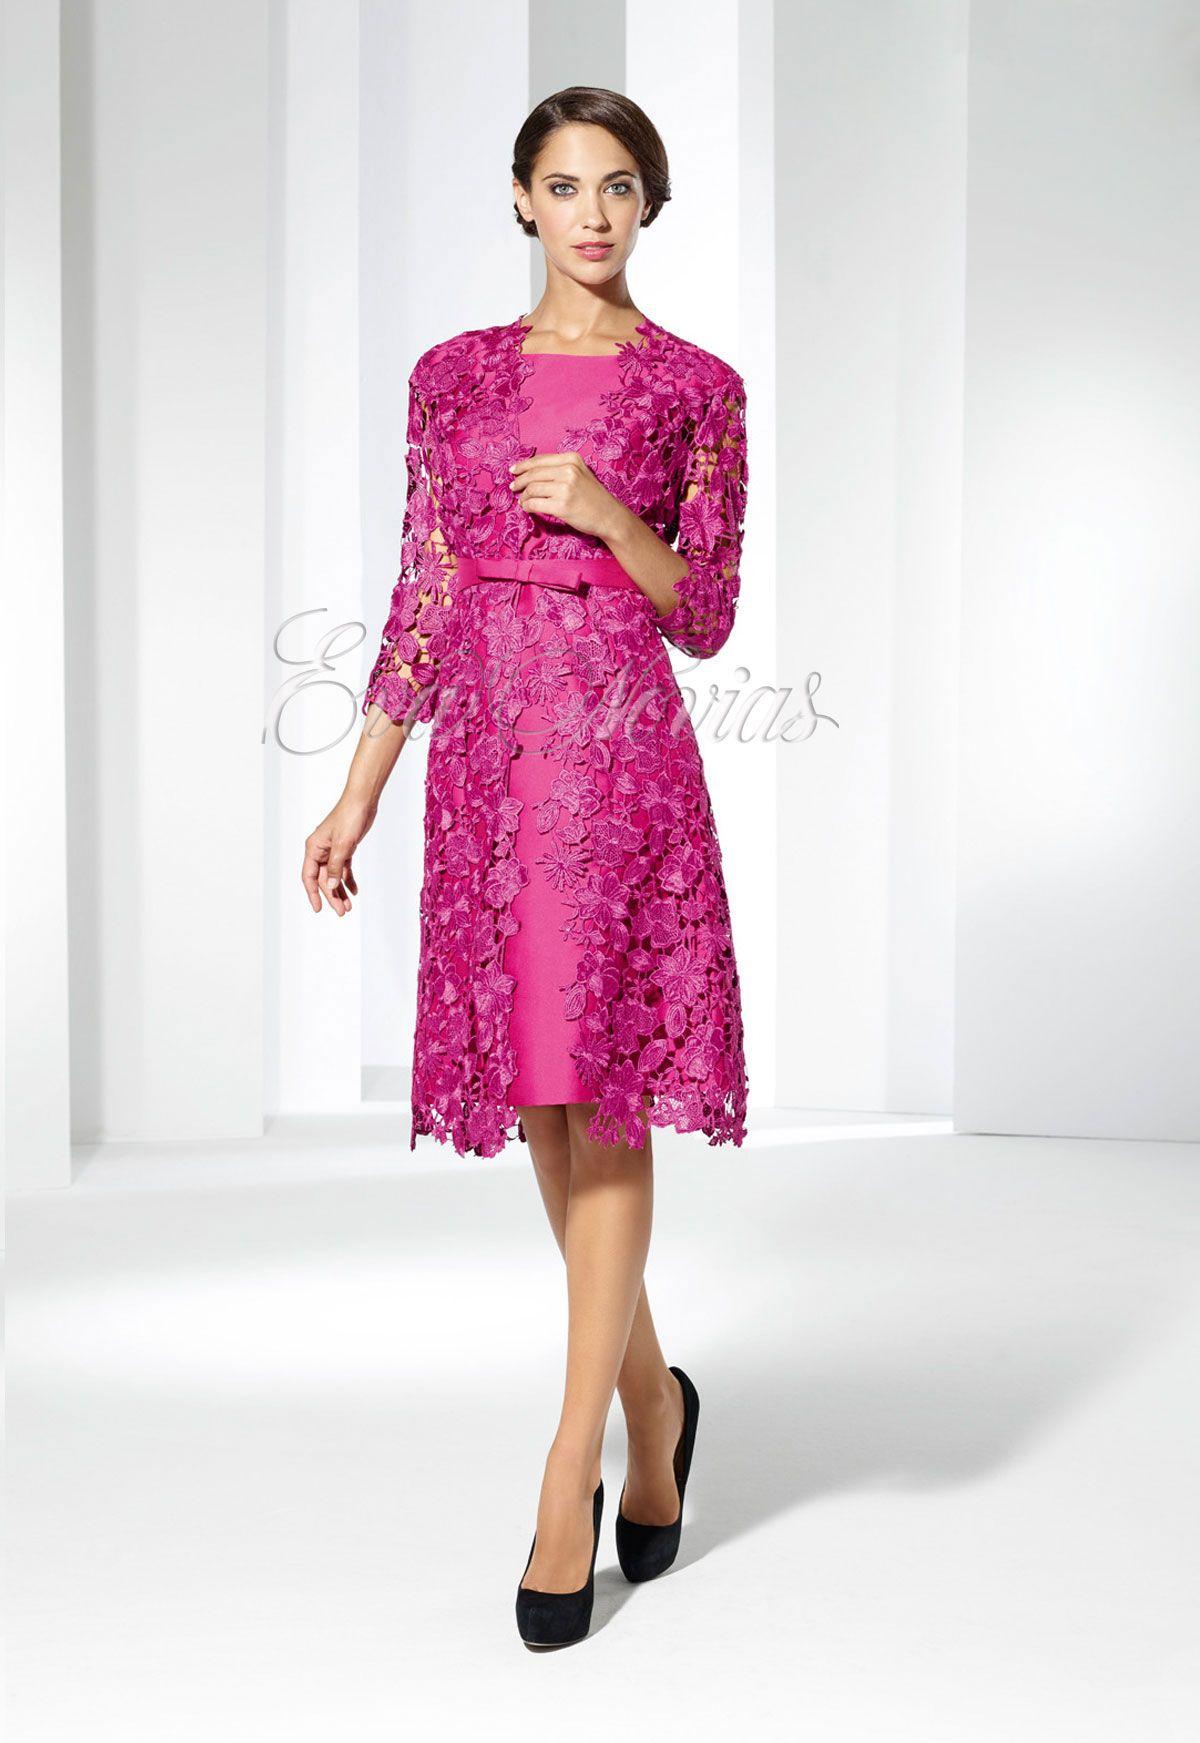 Vestido de fiesta Paloma Camacho Modelo 2728 | fiesta | Pinterest ...